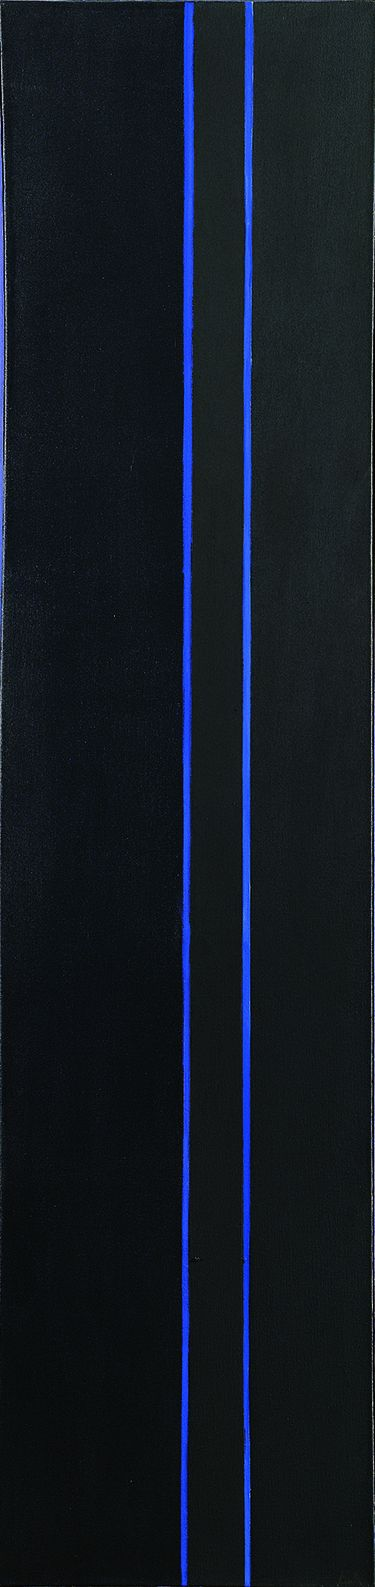 Barnett Newman By Twos, 1949